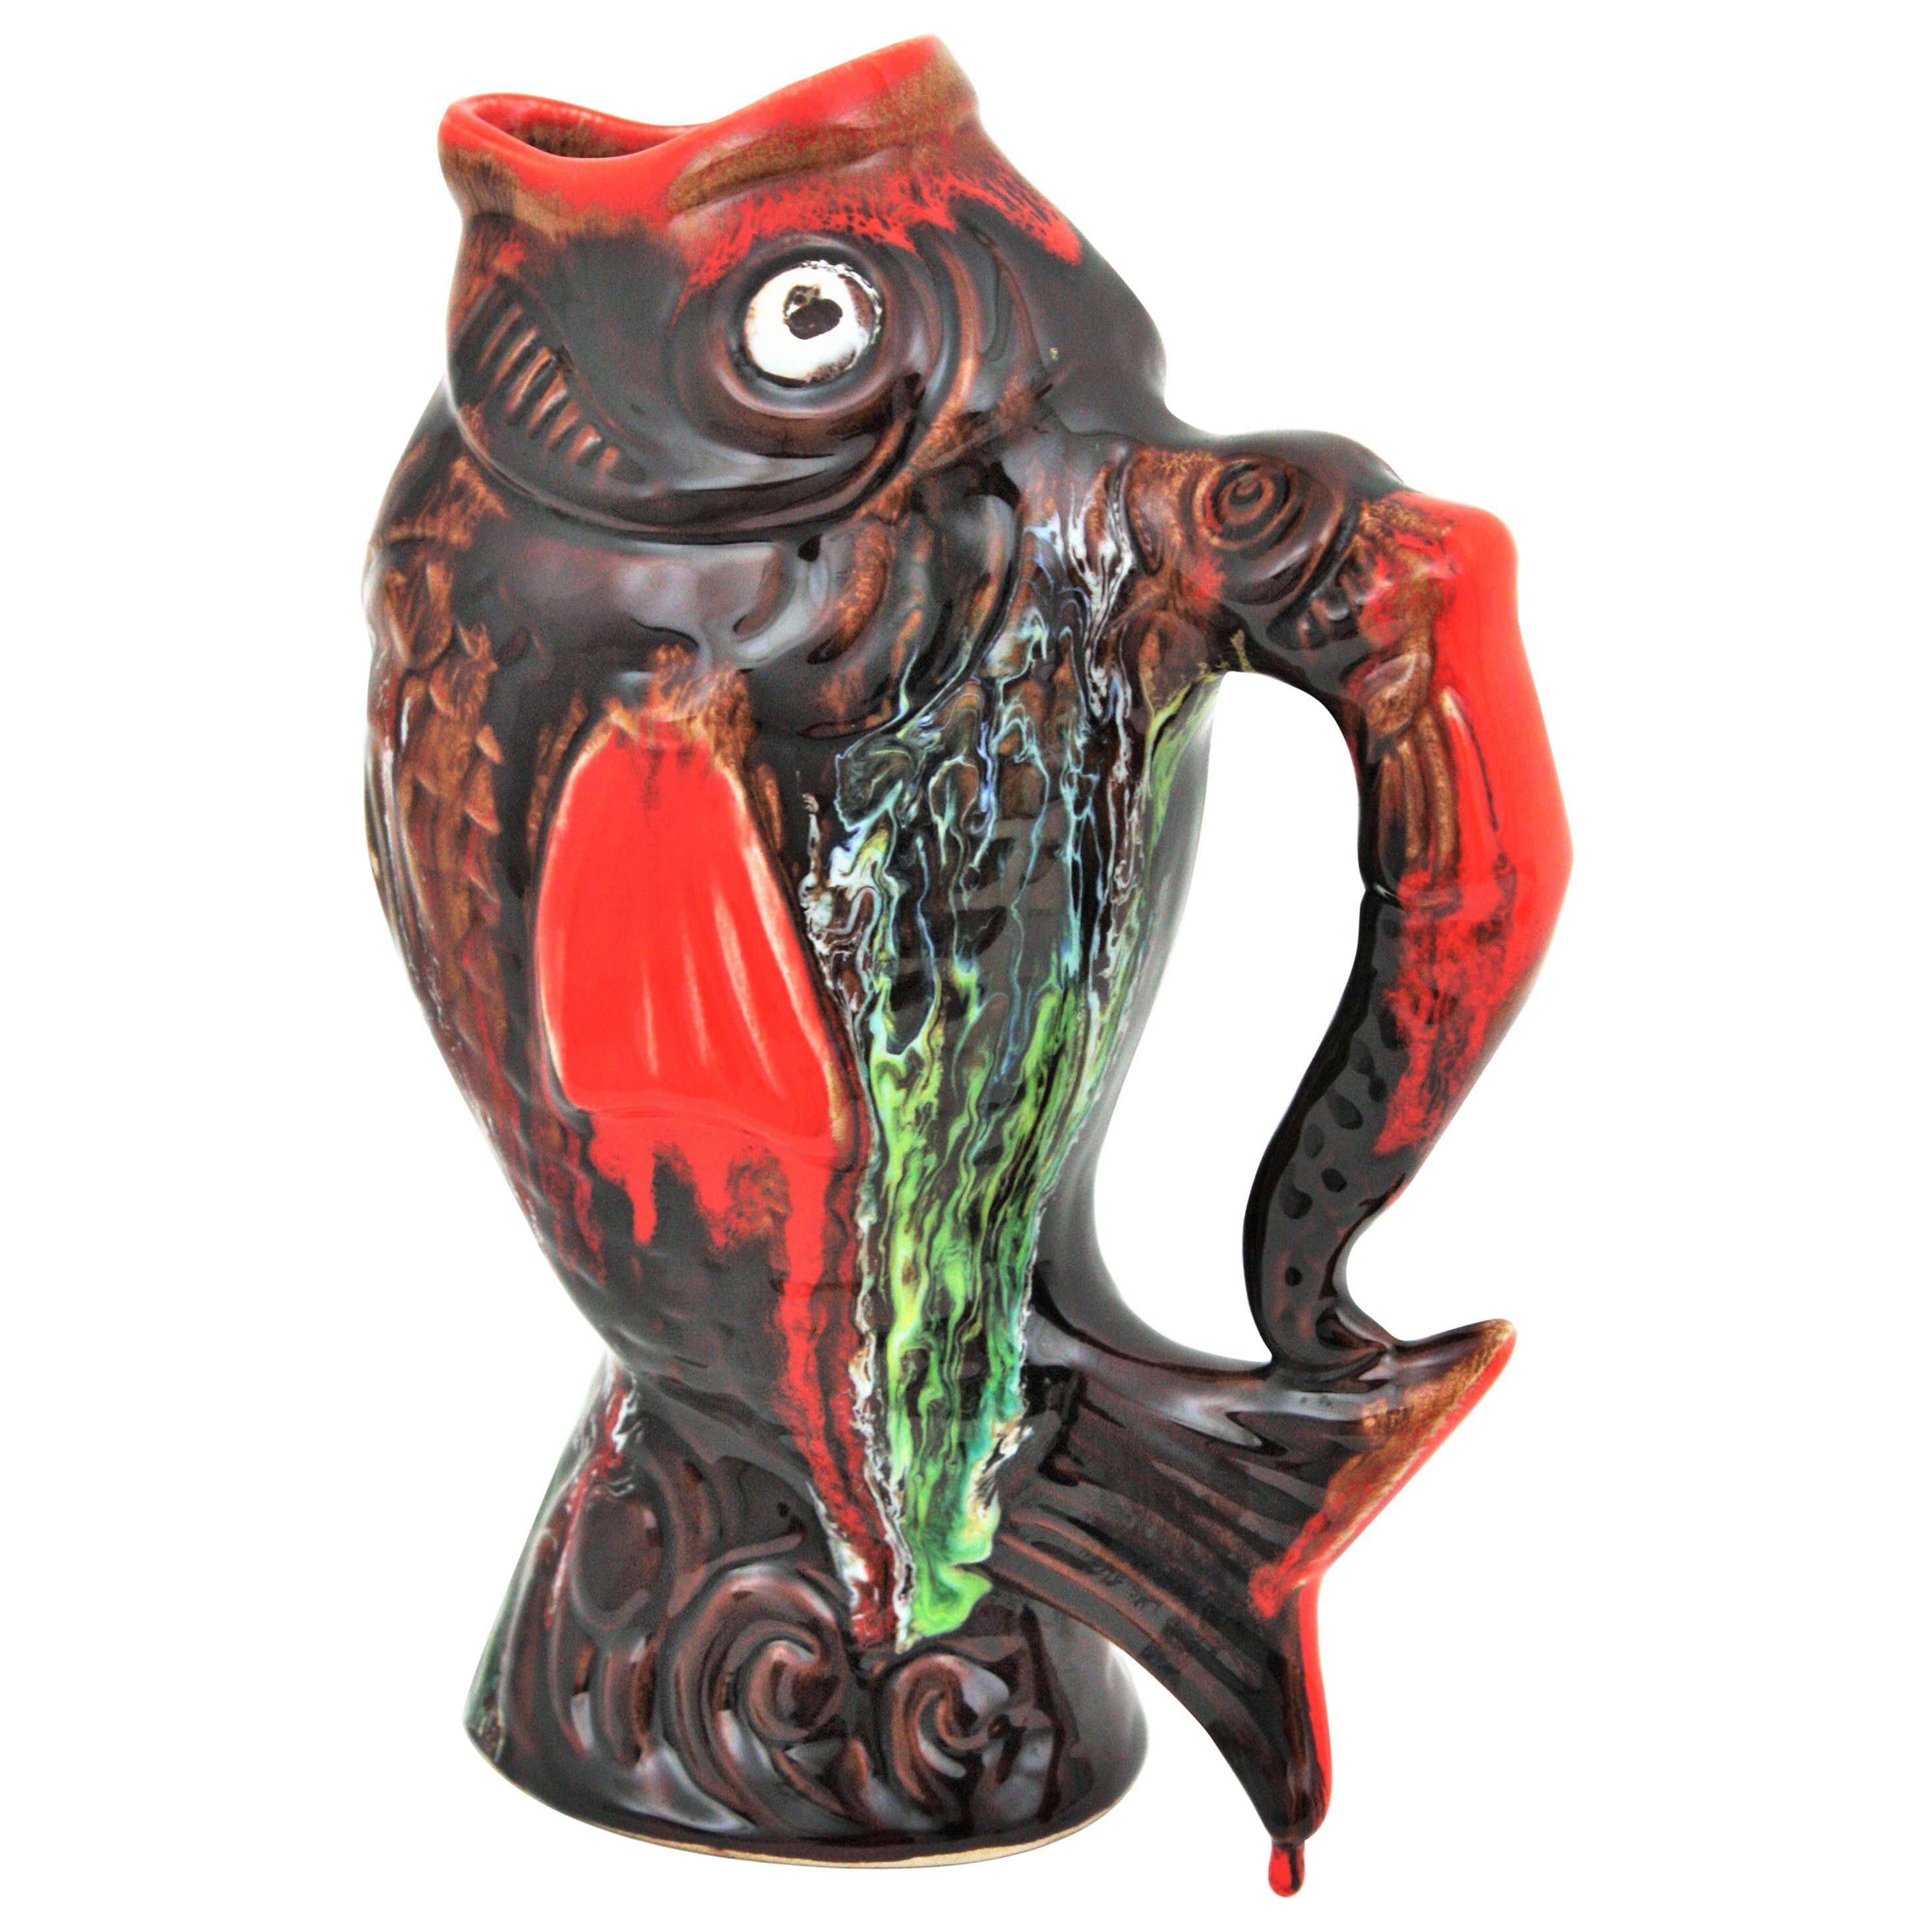 Glazed Ceramic Gurgle Fish Jug Tall Pitcher by Vallauris, 1950s